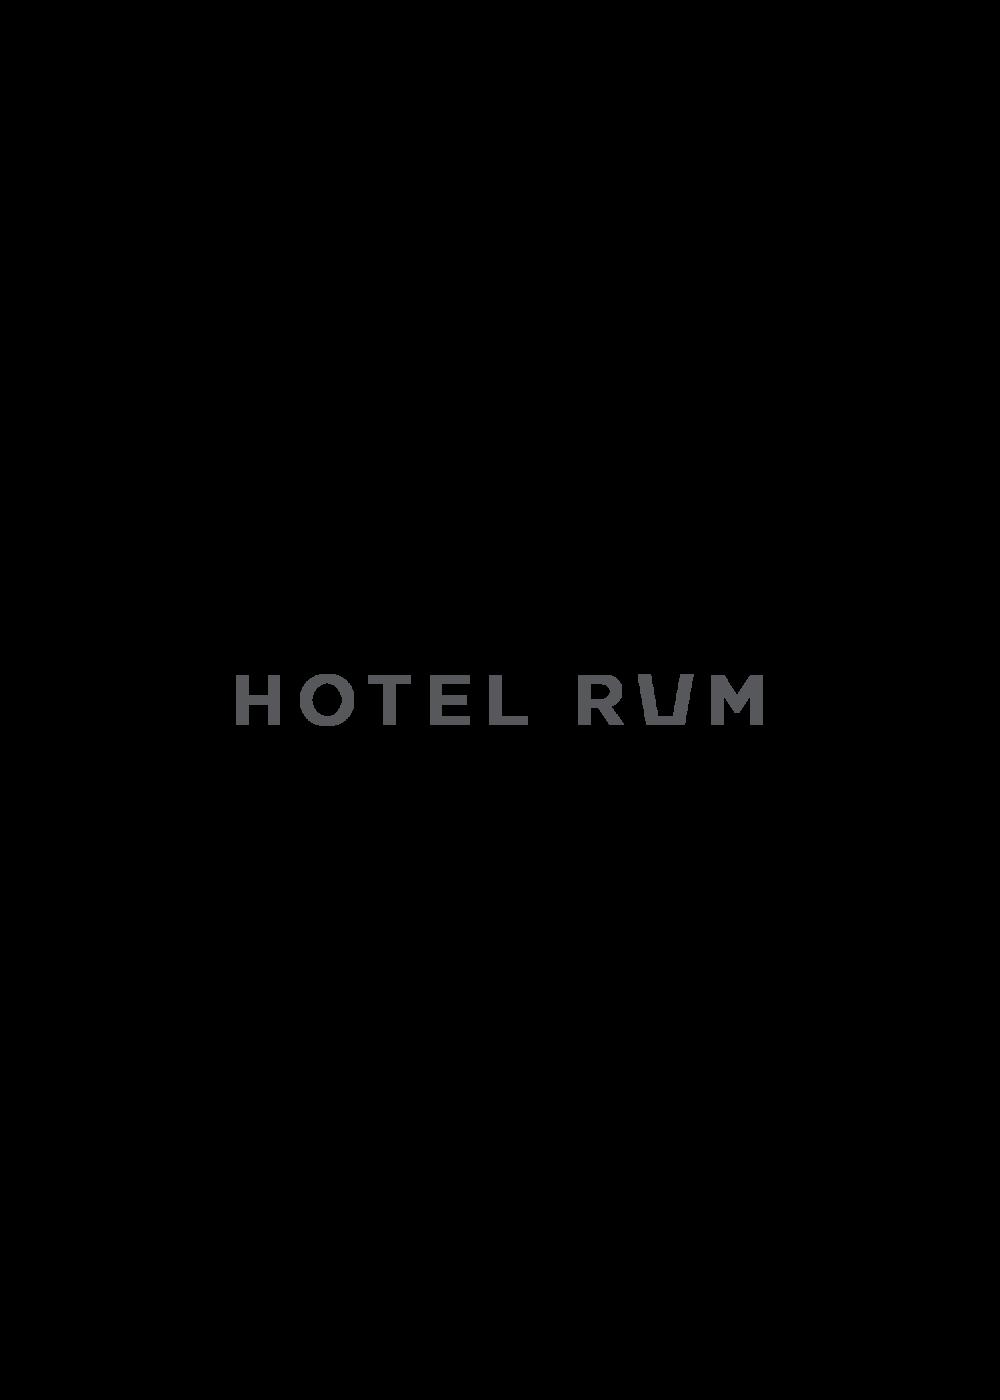 logo_hotel_rum.png